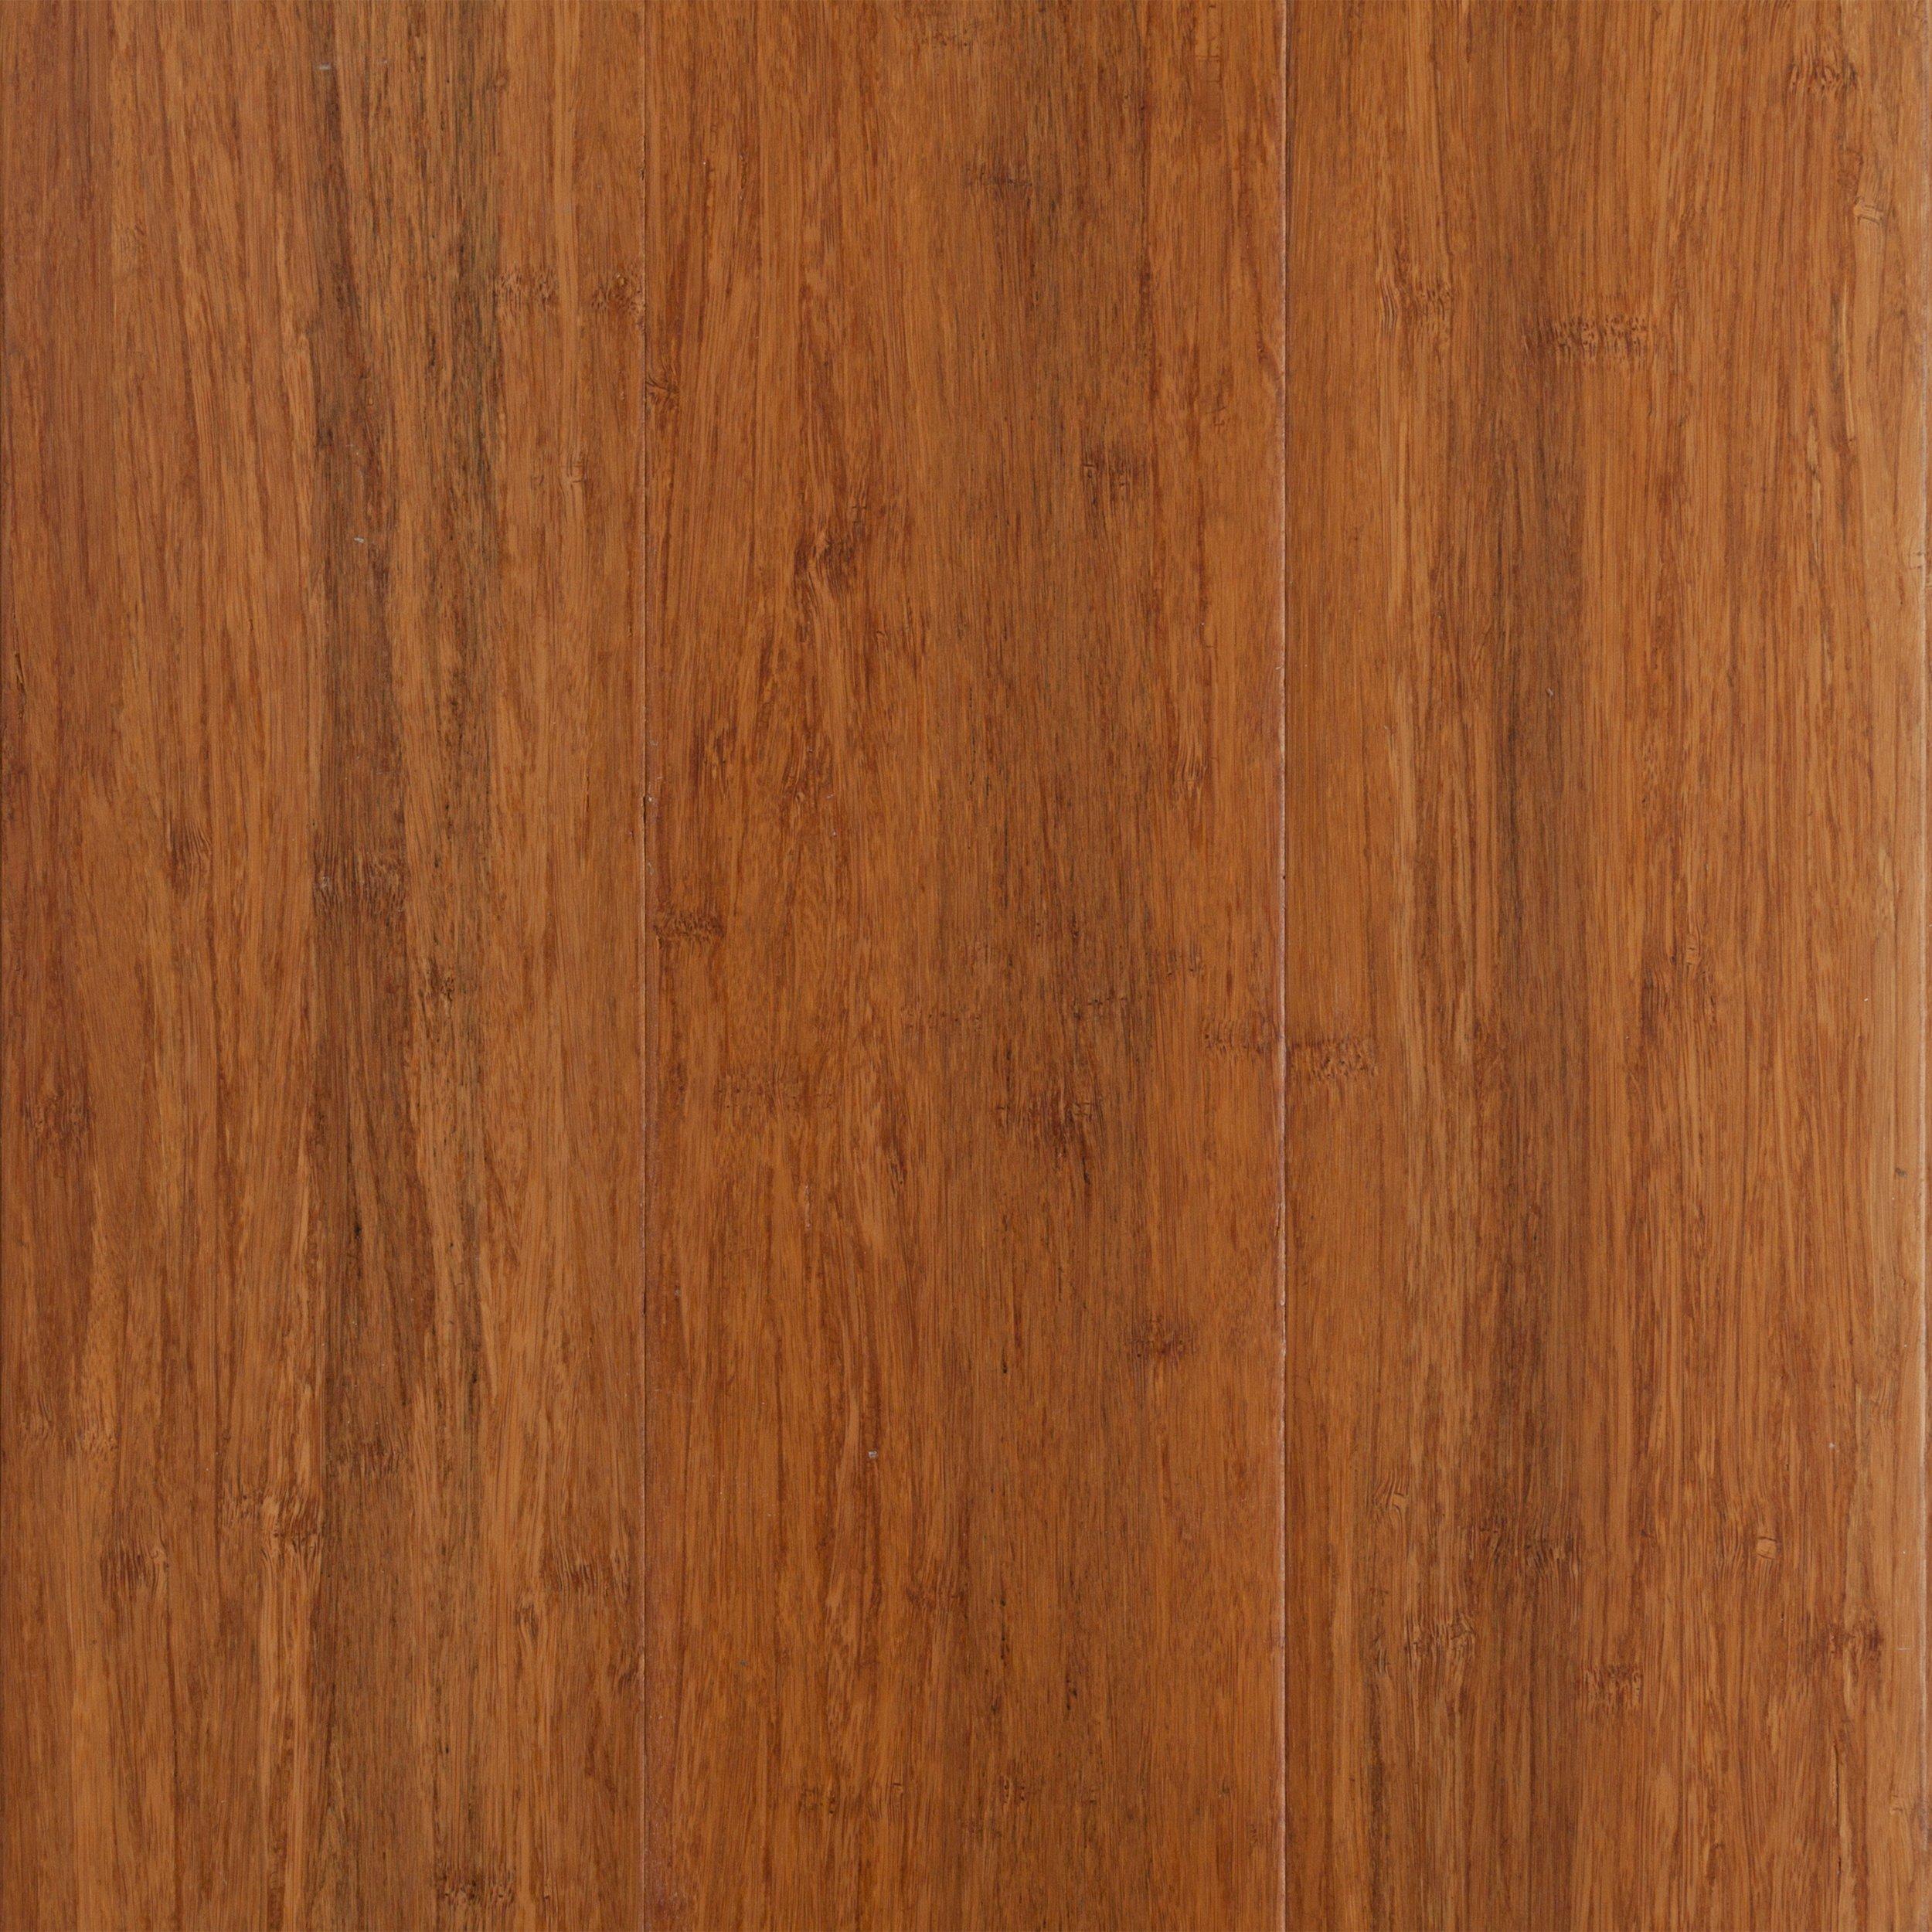 Bamboo Engineered Hardwood Flooring Tiger Strand Woven Tobagotiger Engineered Wide Plank Bamboo